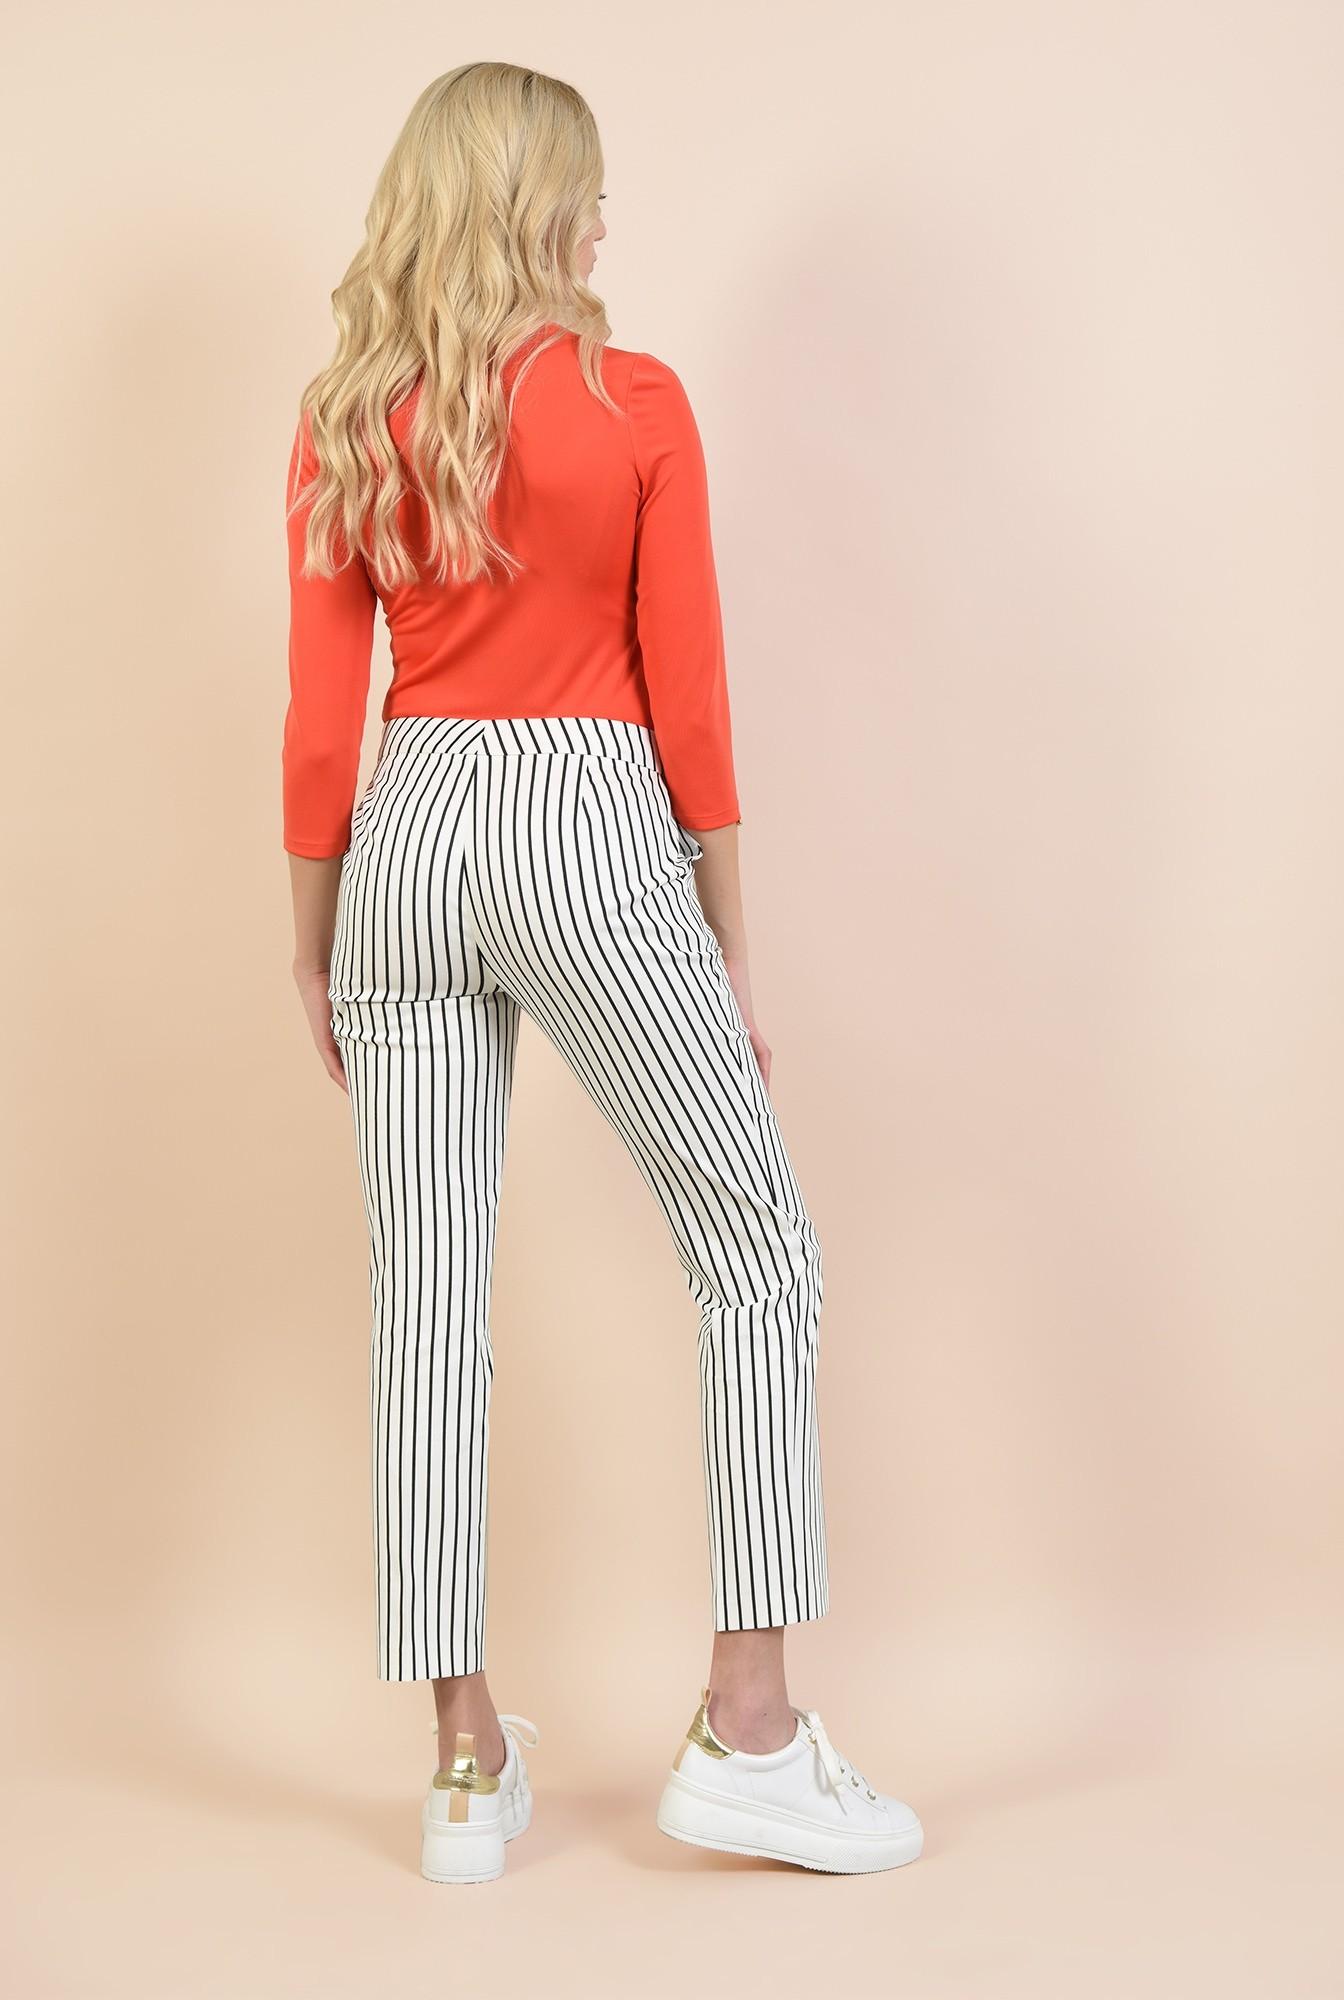 1 - pantaloni alb-bleumarin, cu print dungi, croi tigareta